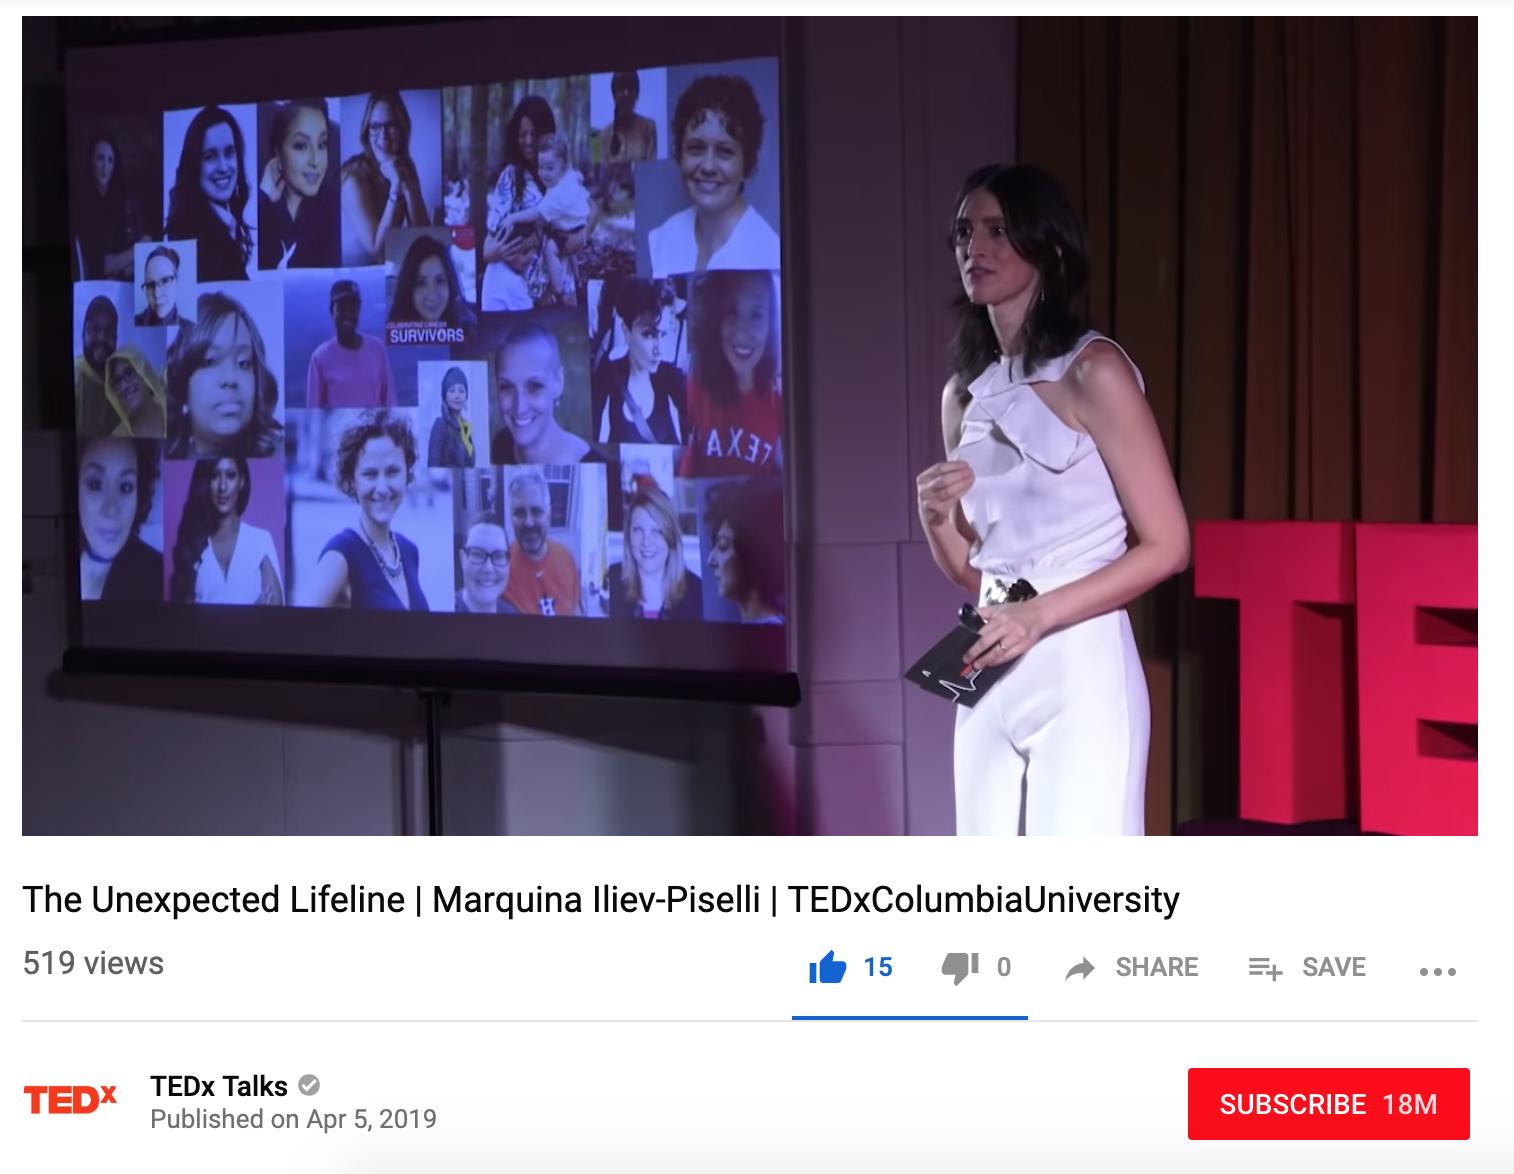 TEDx Talk - The Unexpected Lifeline